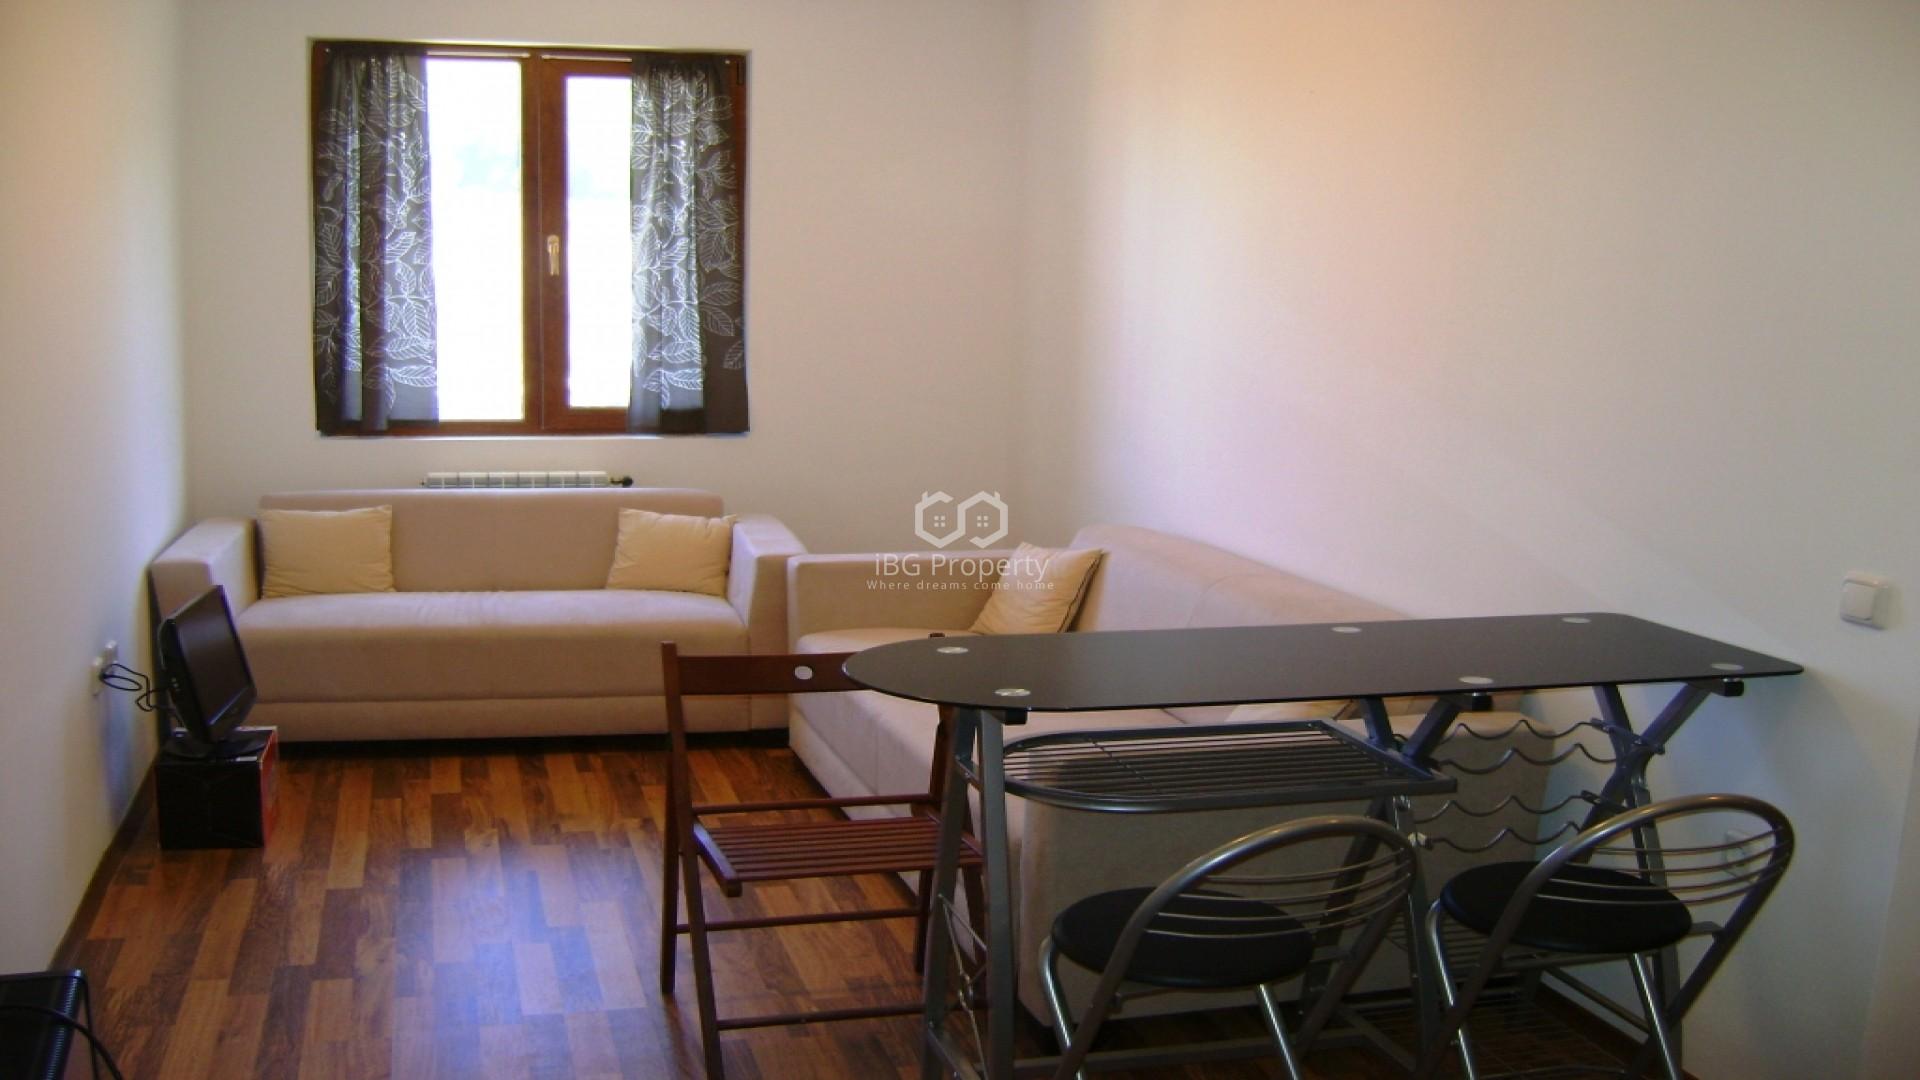 Двухкомнатная квартира Банско 41 m2